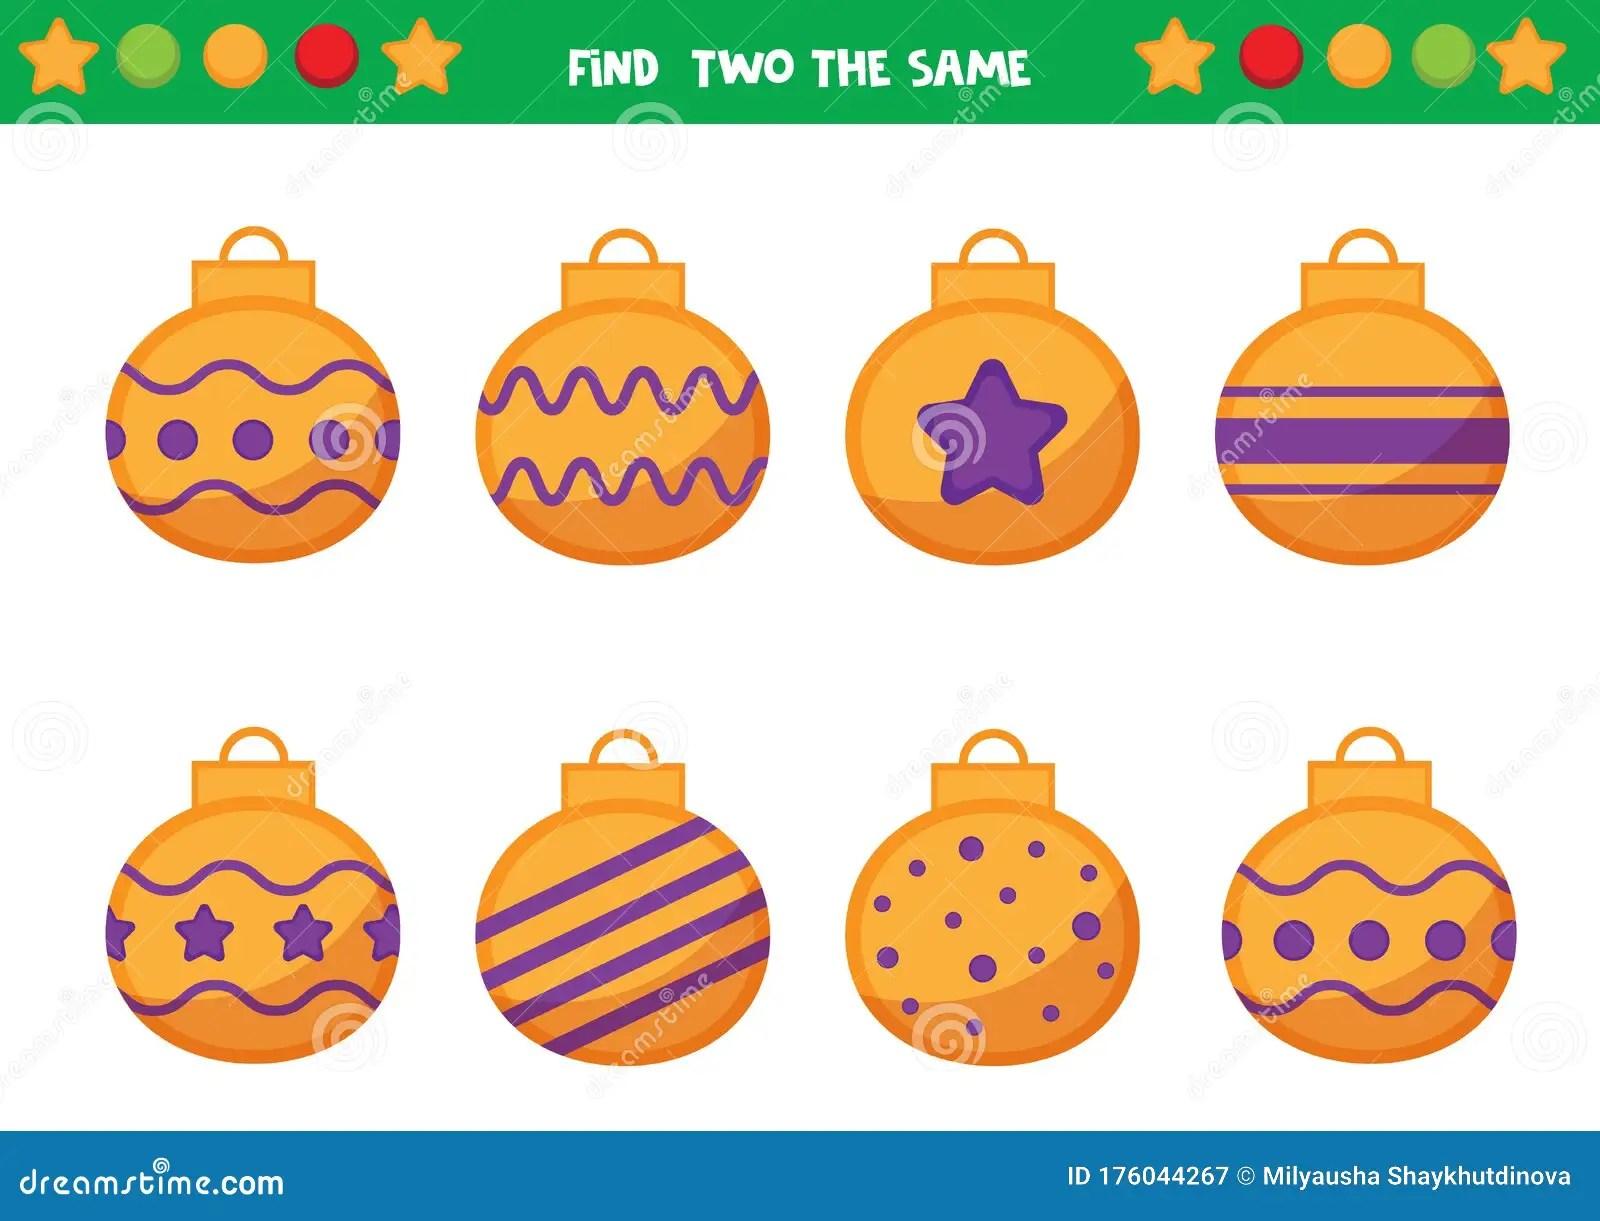 Christmas Worksheet For Preschool Children Find Two The